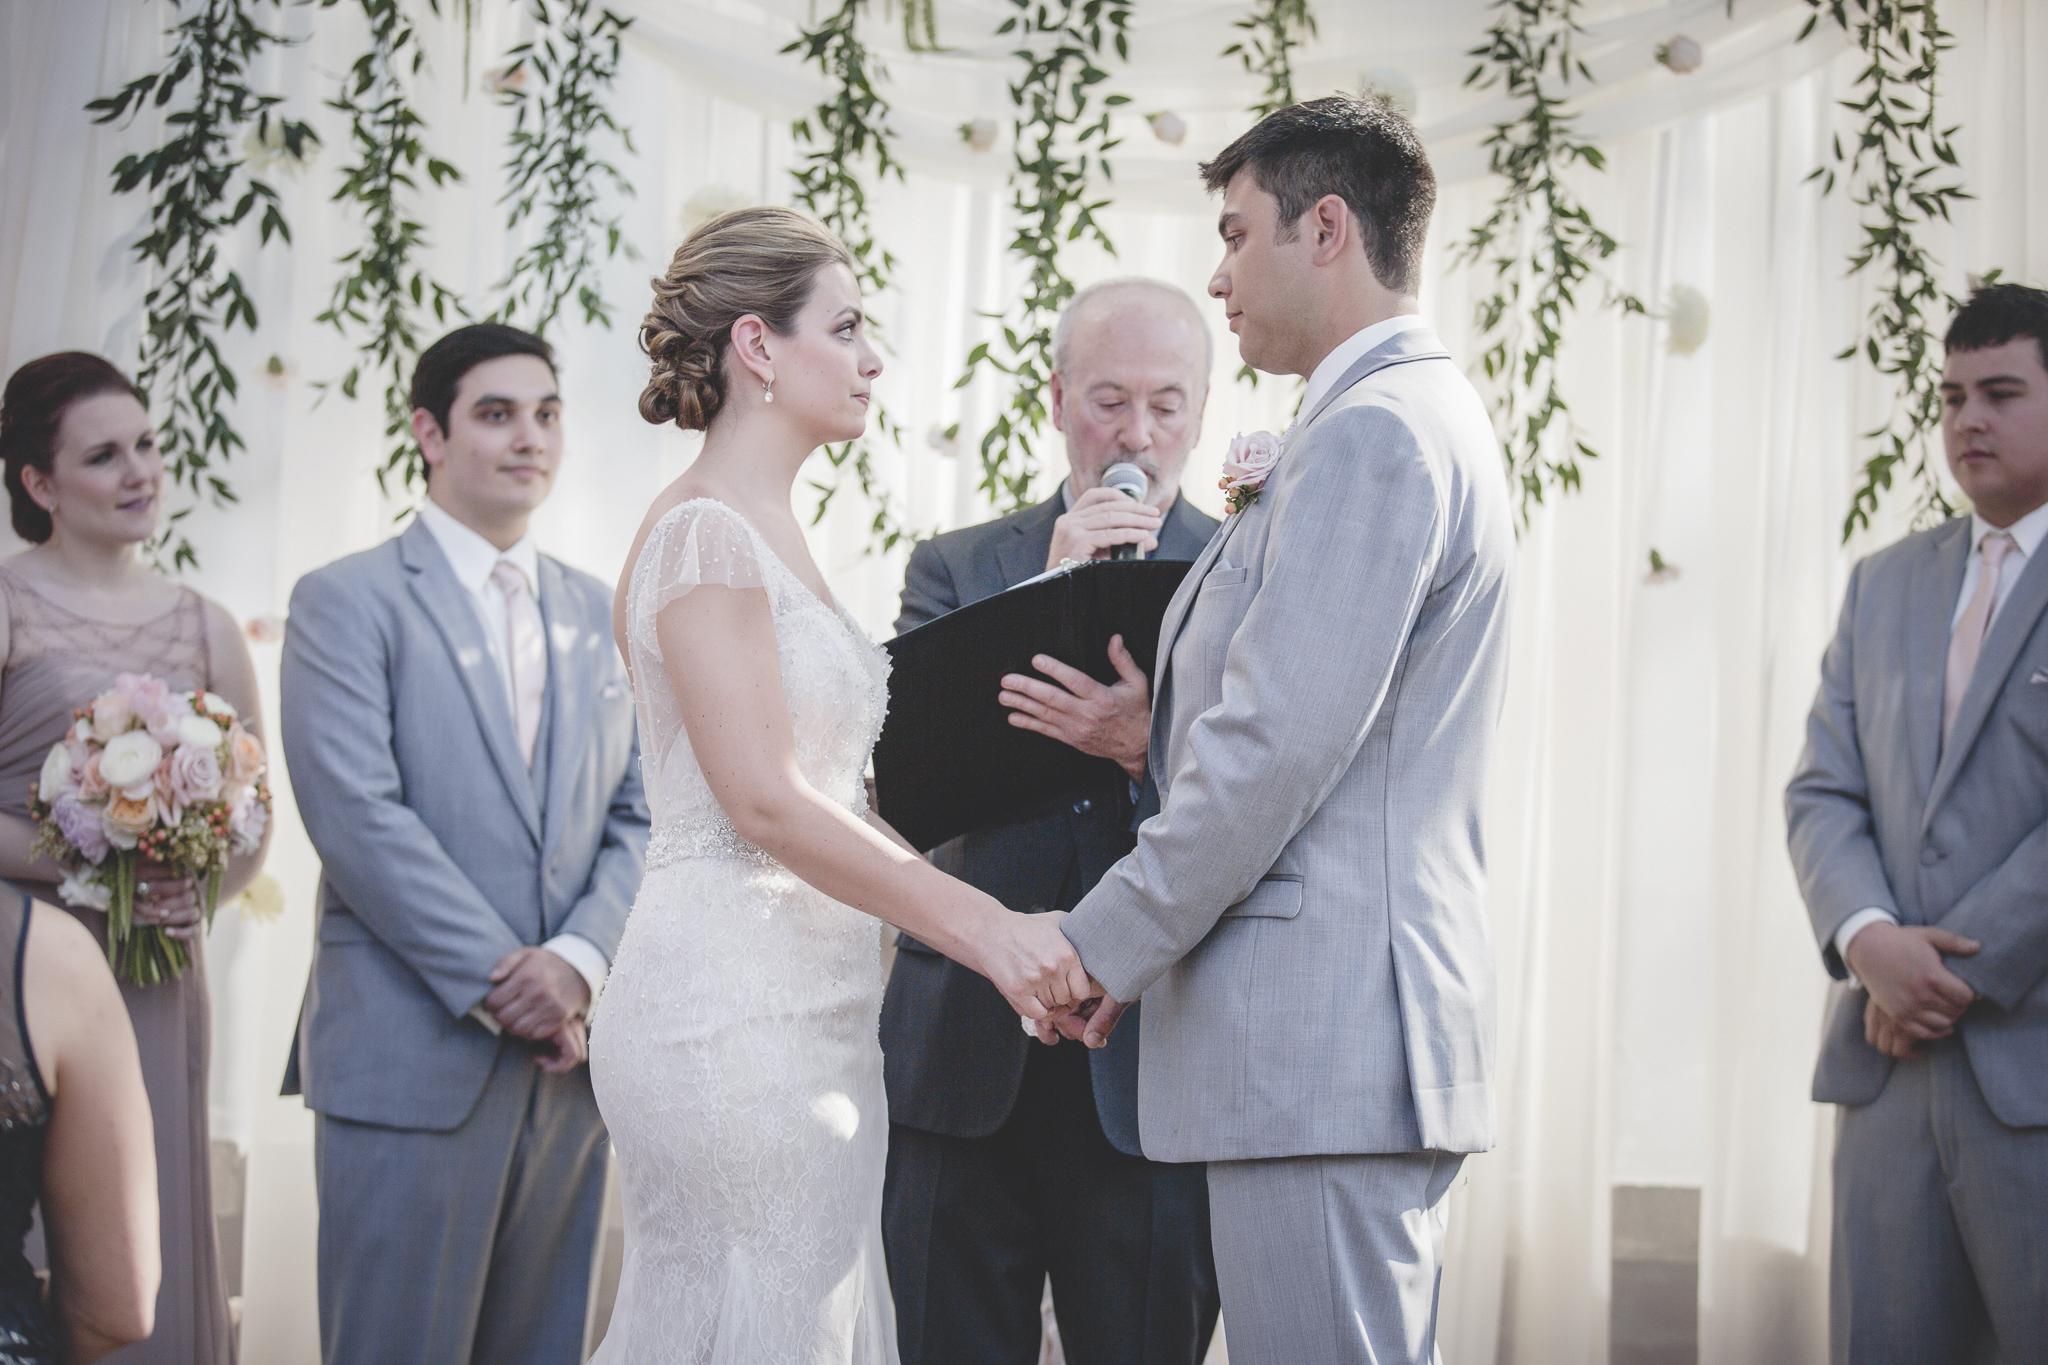 minneapolis event center wedding photographer-17.jpg